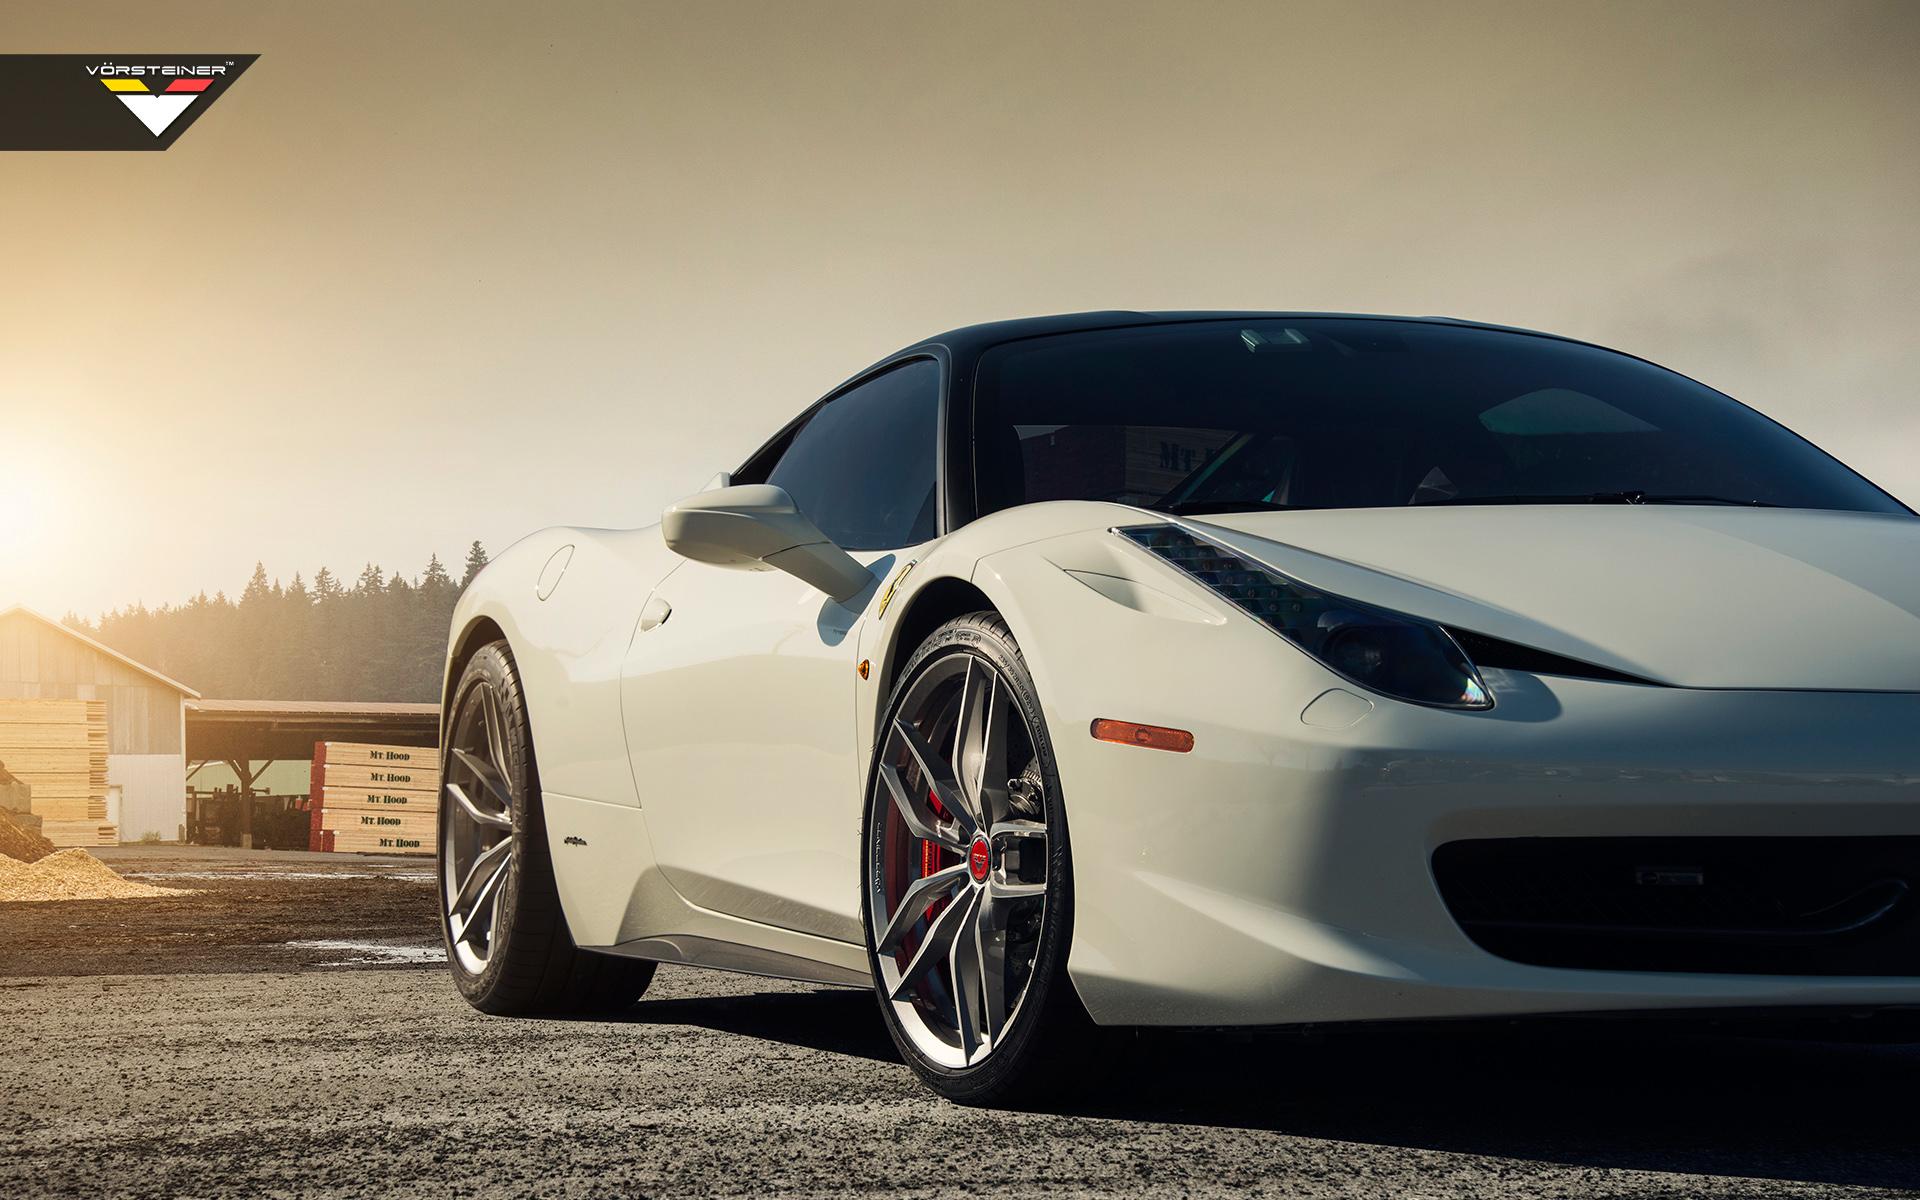 Ferrari 458 italia vorsteiner v ff 105 wheels4 wallpaper - Ferrari hd wallpapers free download ...